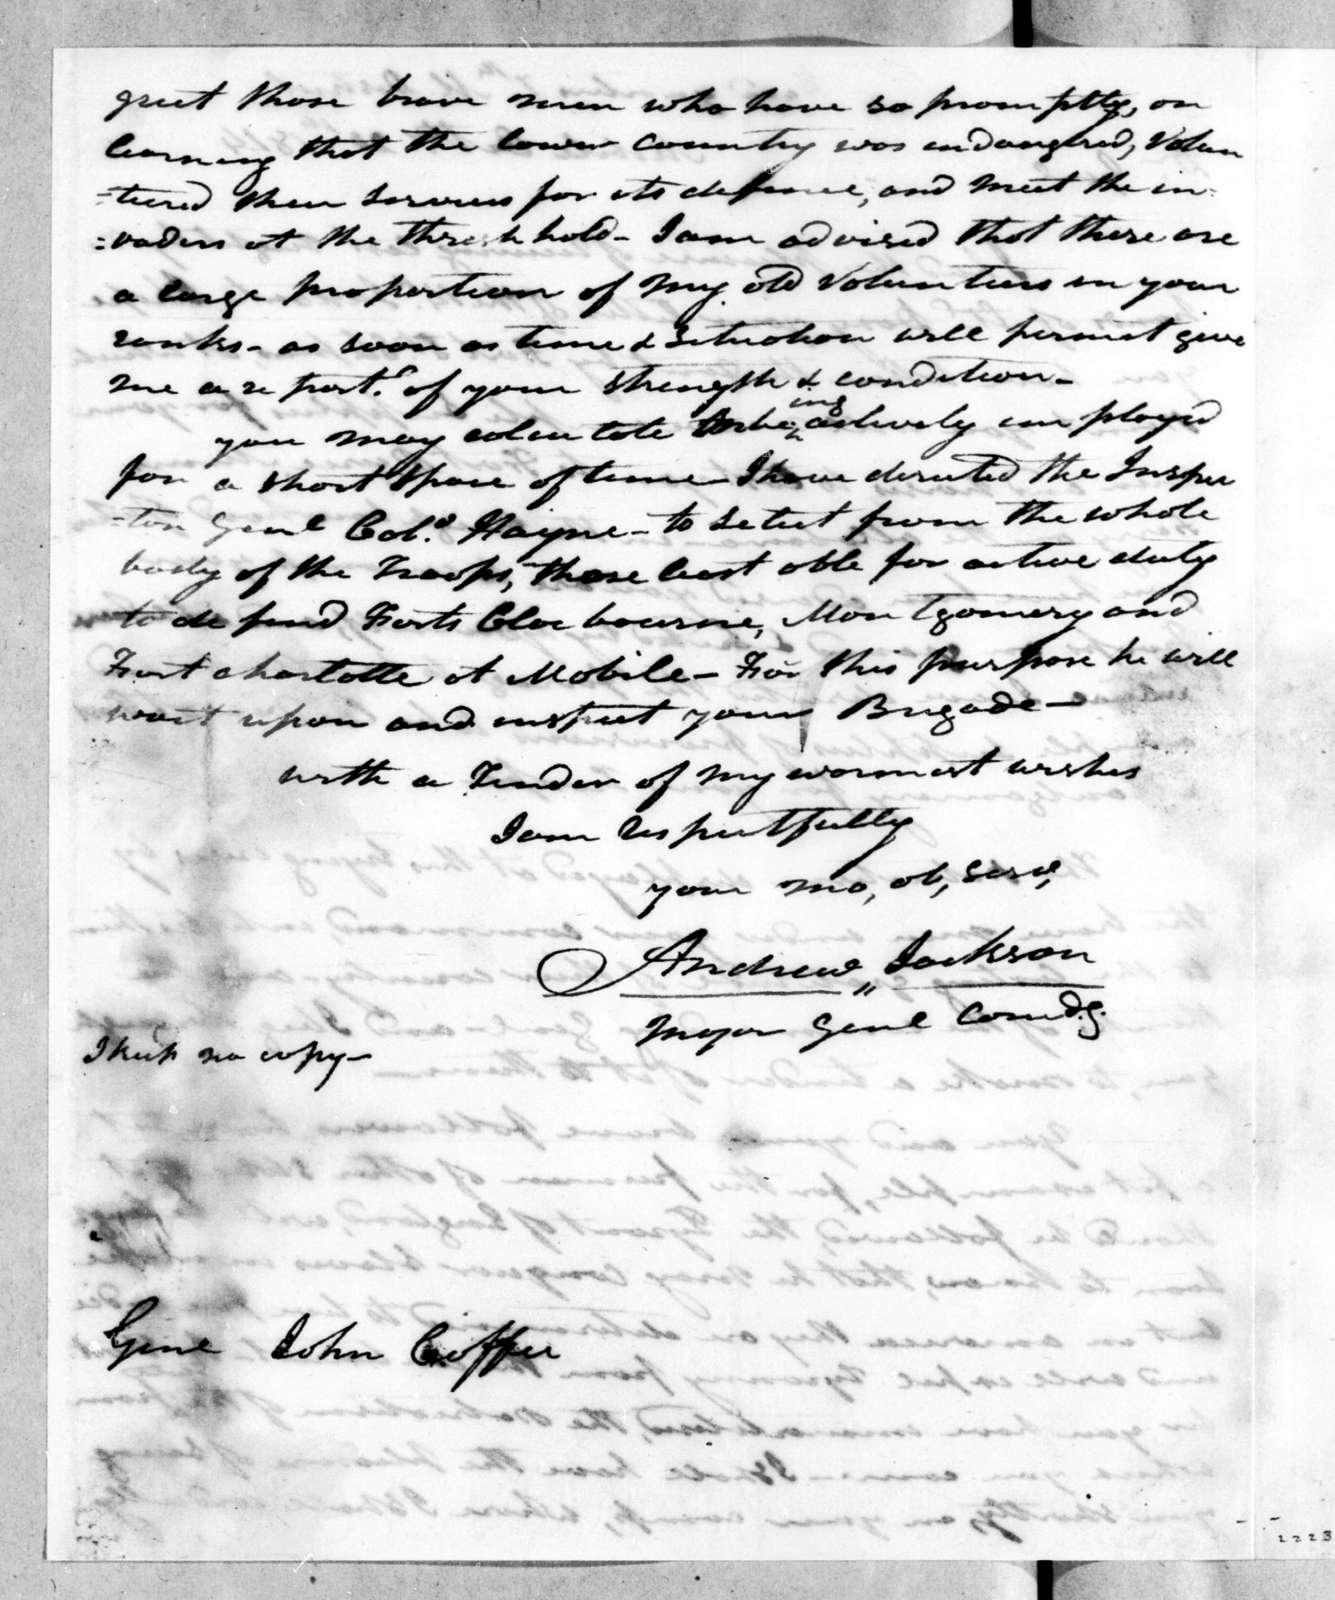 Andrew Jackson to John Coffee, October 20, 1814